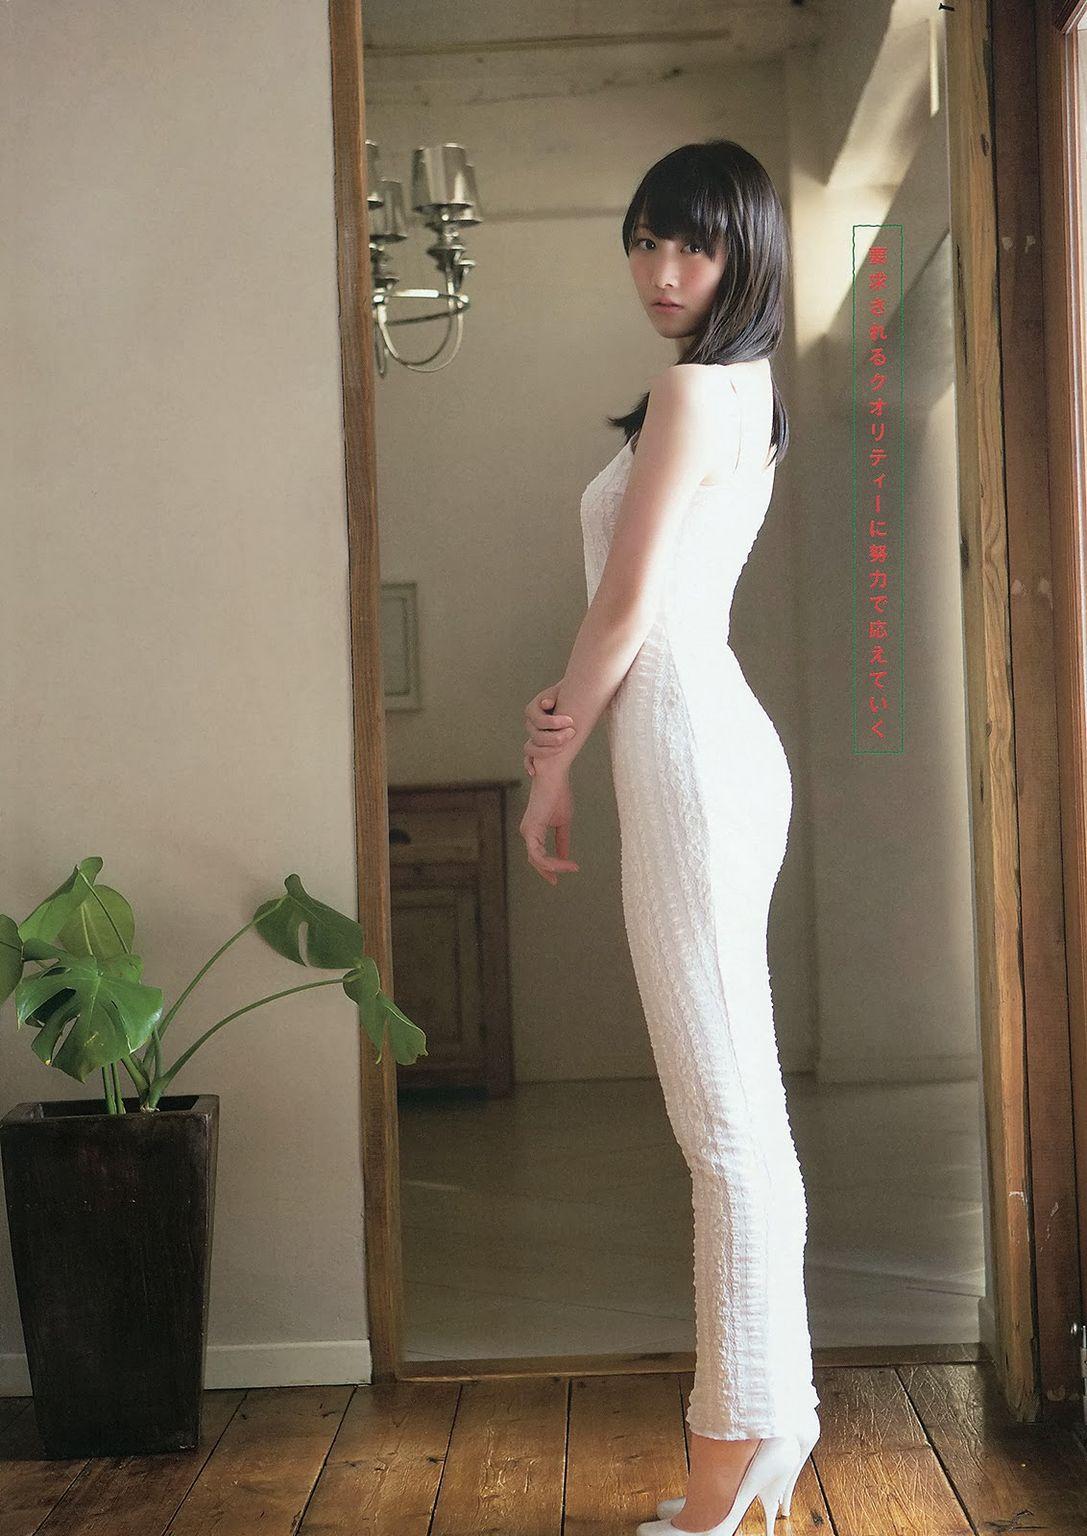 SKE48 Rena Matsui Tomato on Young Animal Magazine 004.jpg